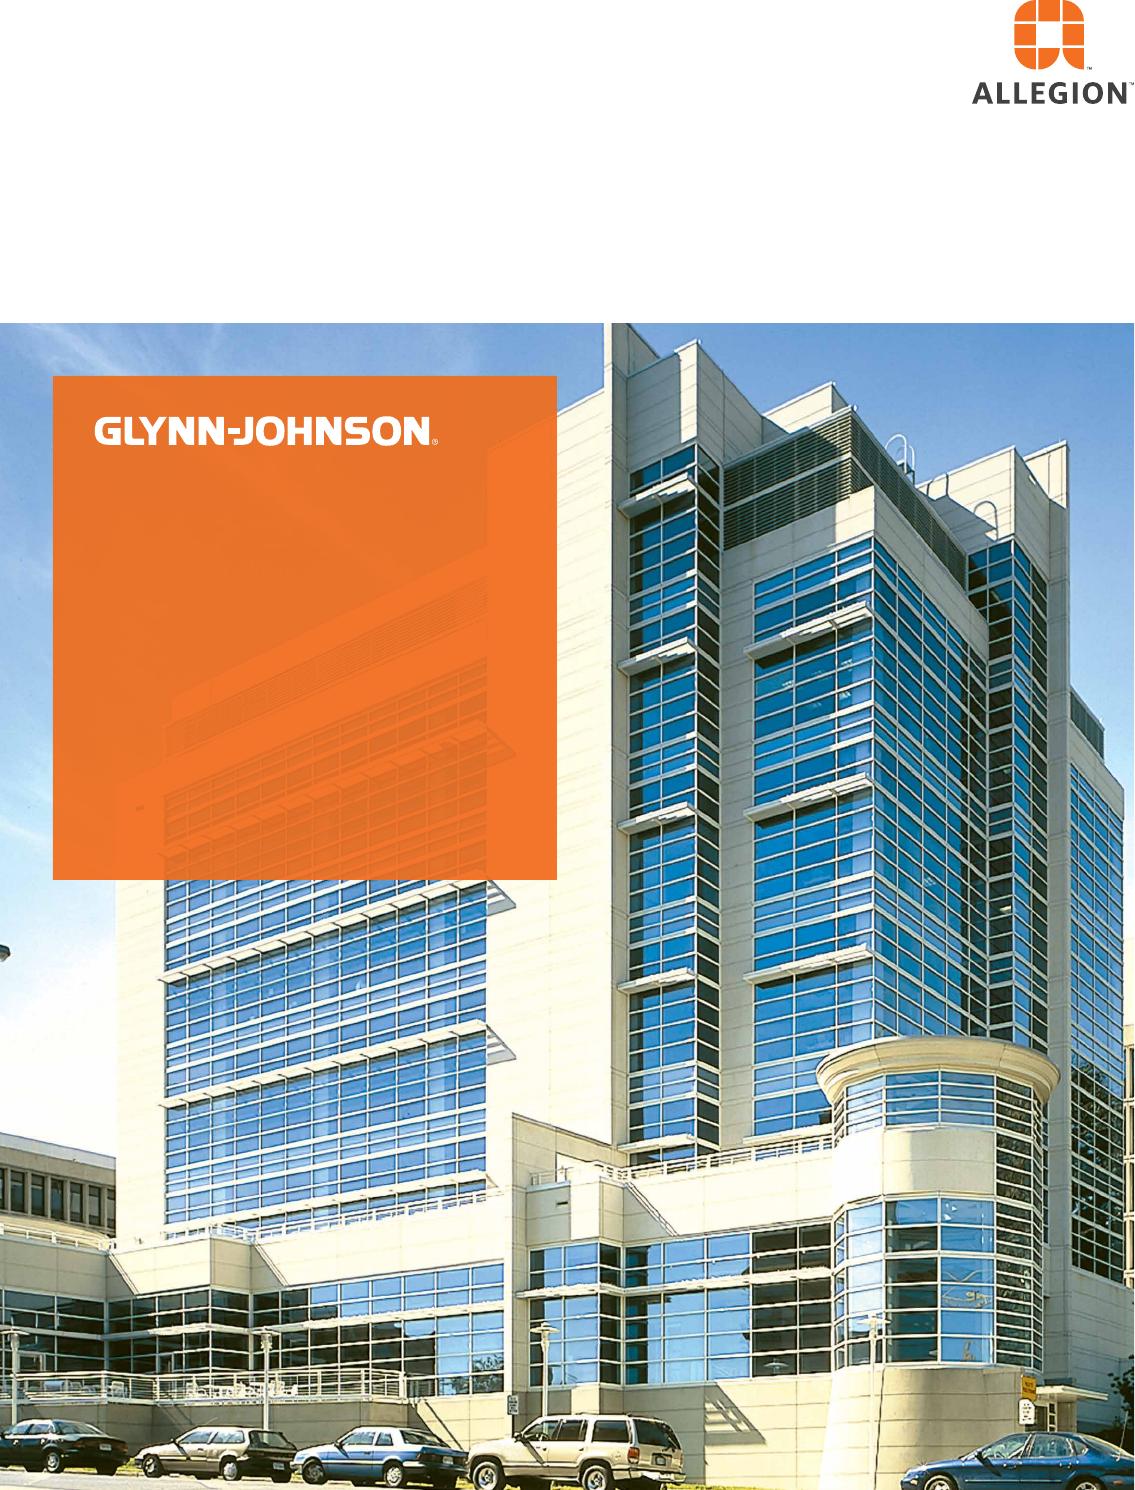 102S-US32D Glynn Johnson Overhead Holders and Stops